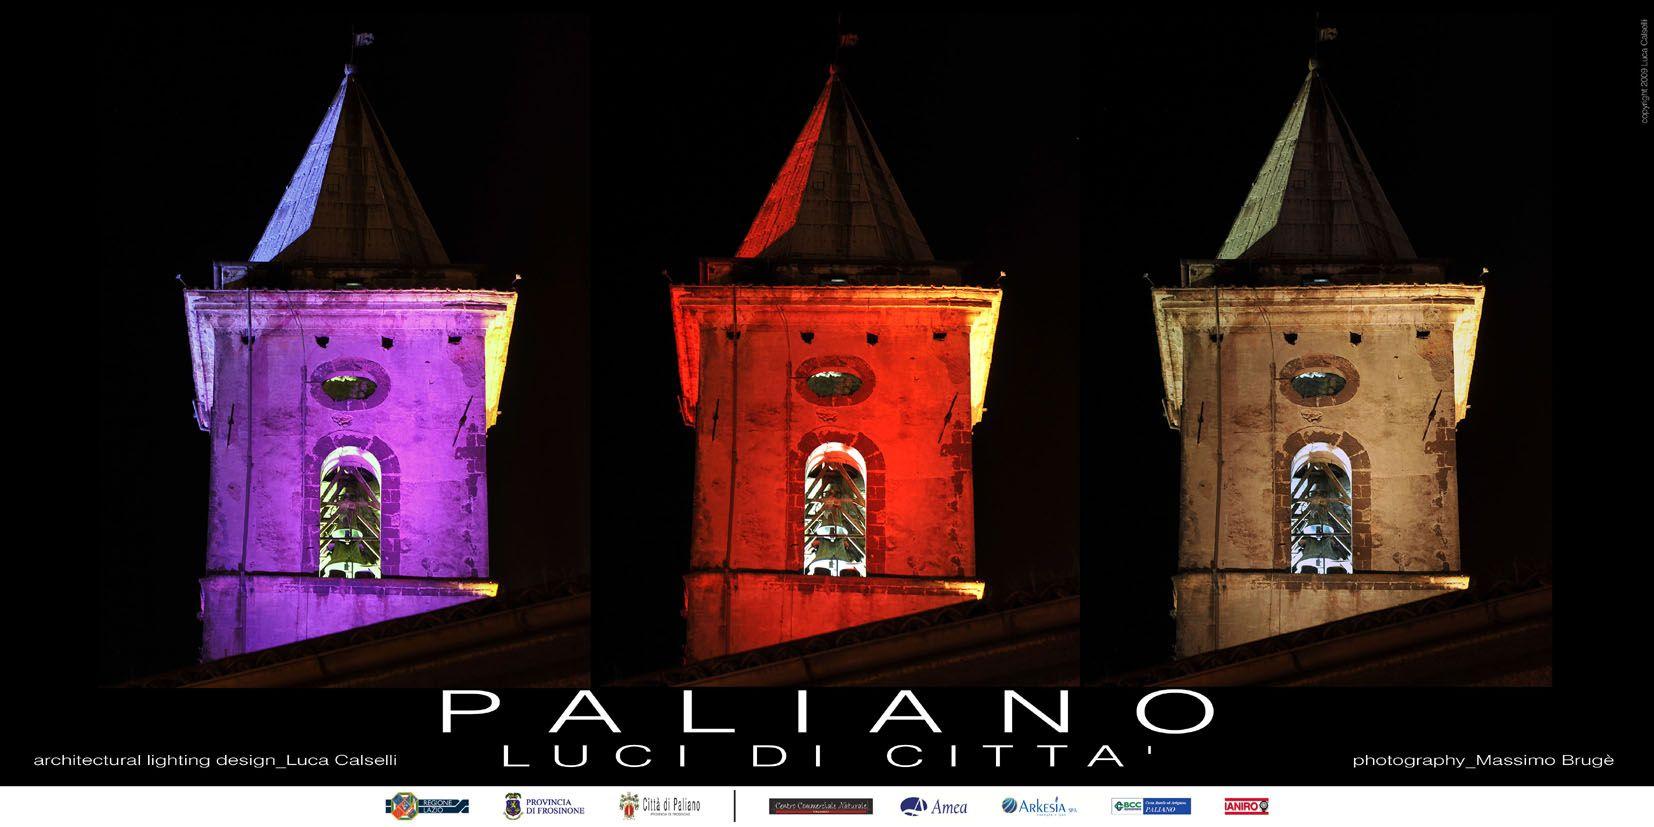 Paliano - Luci di Città